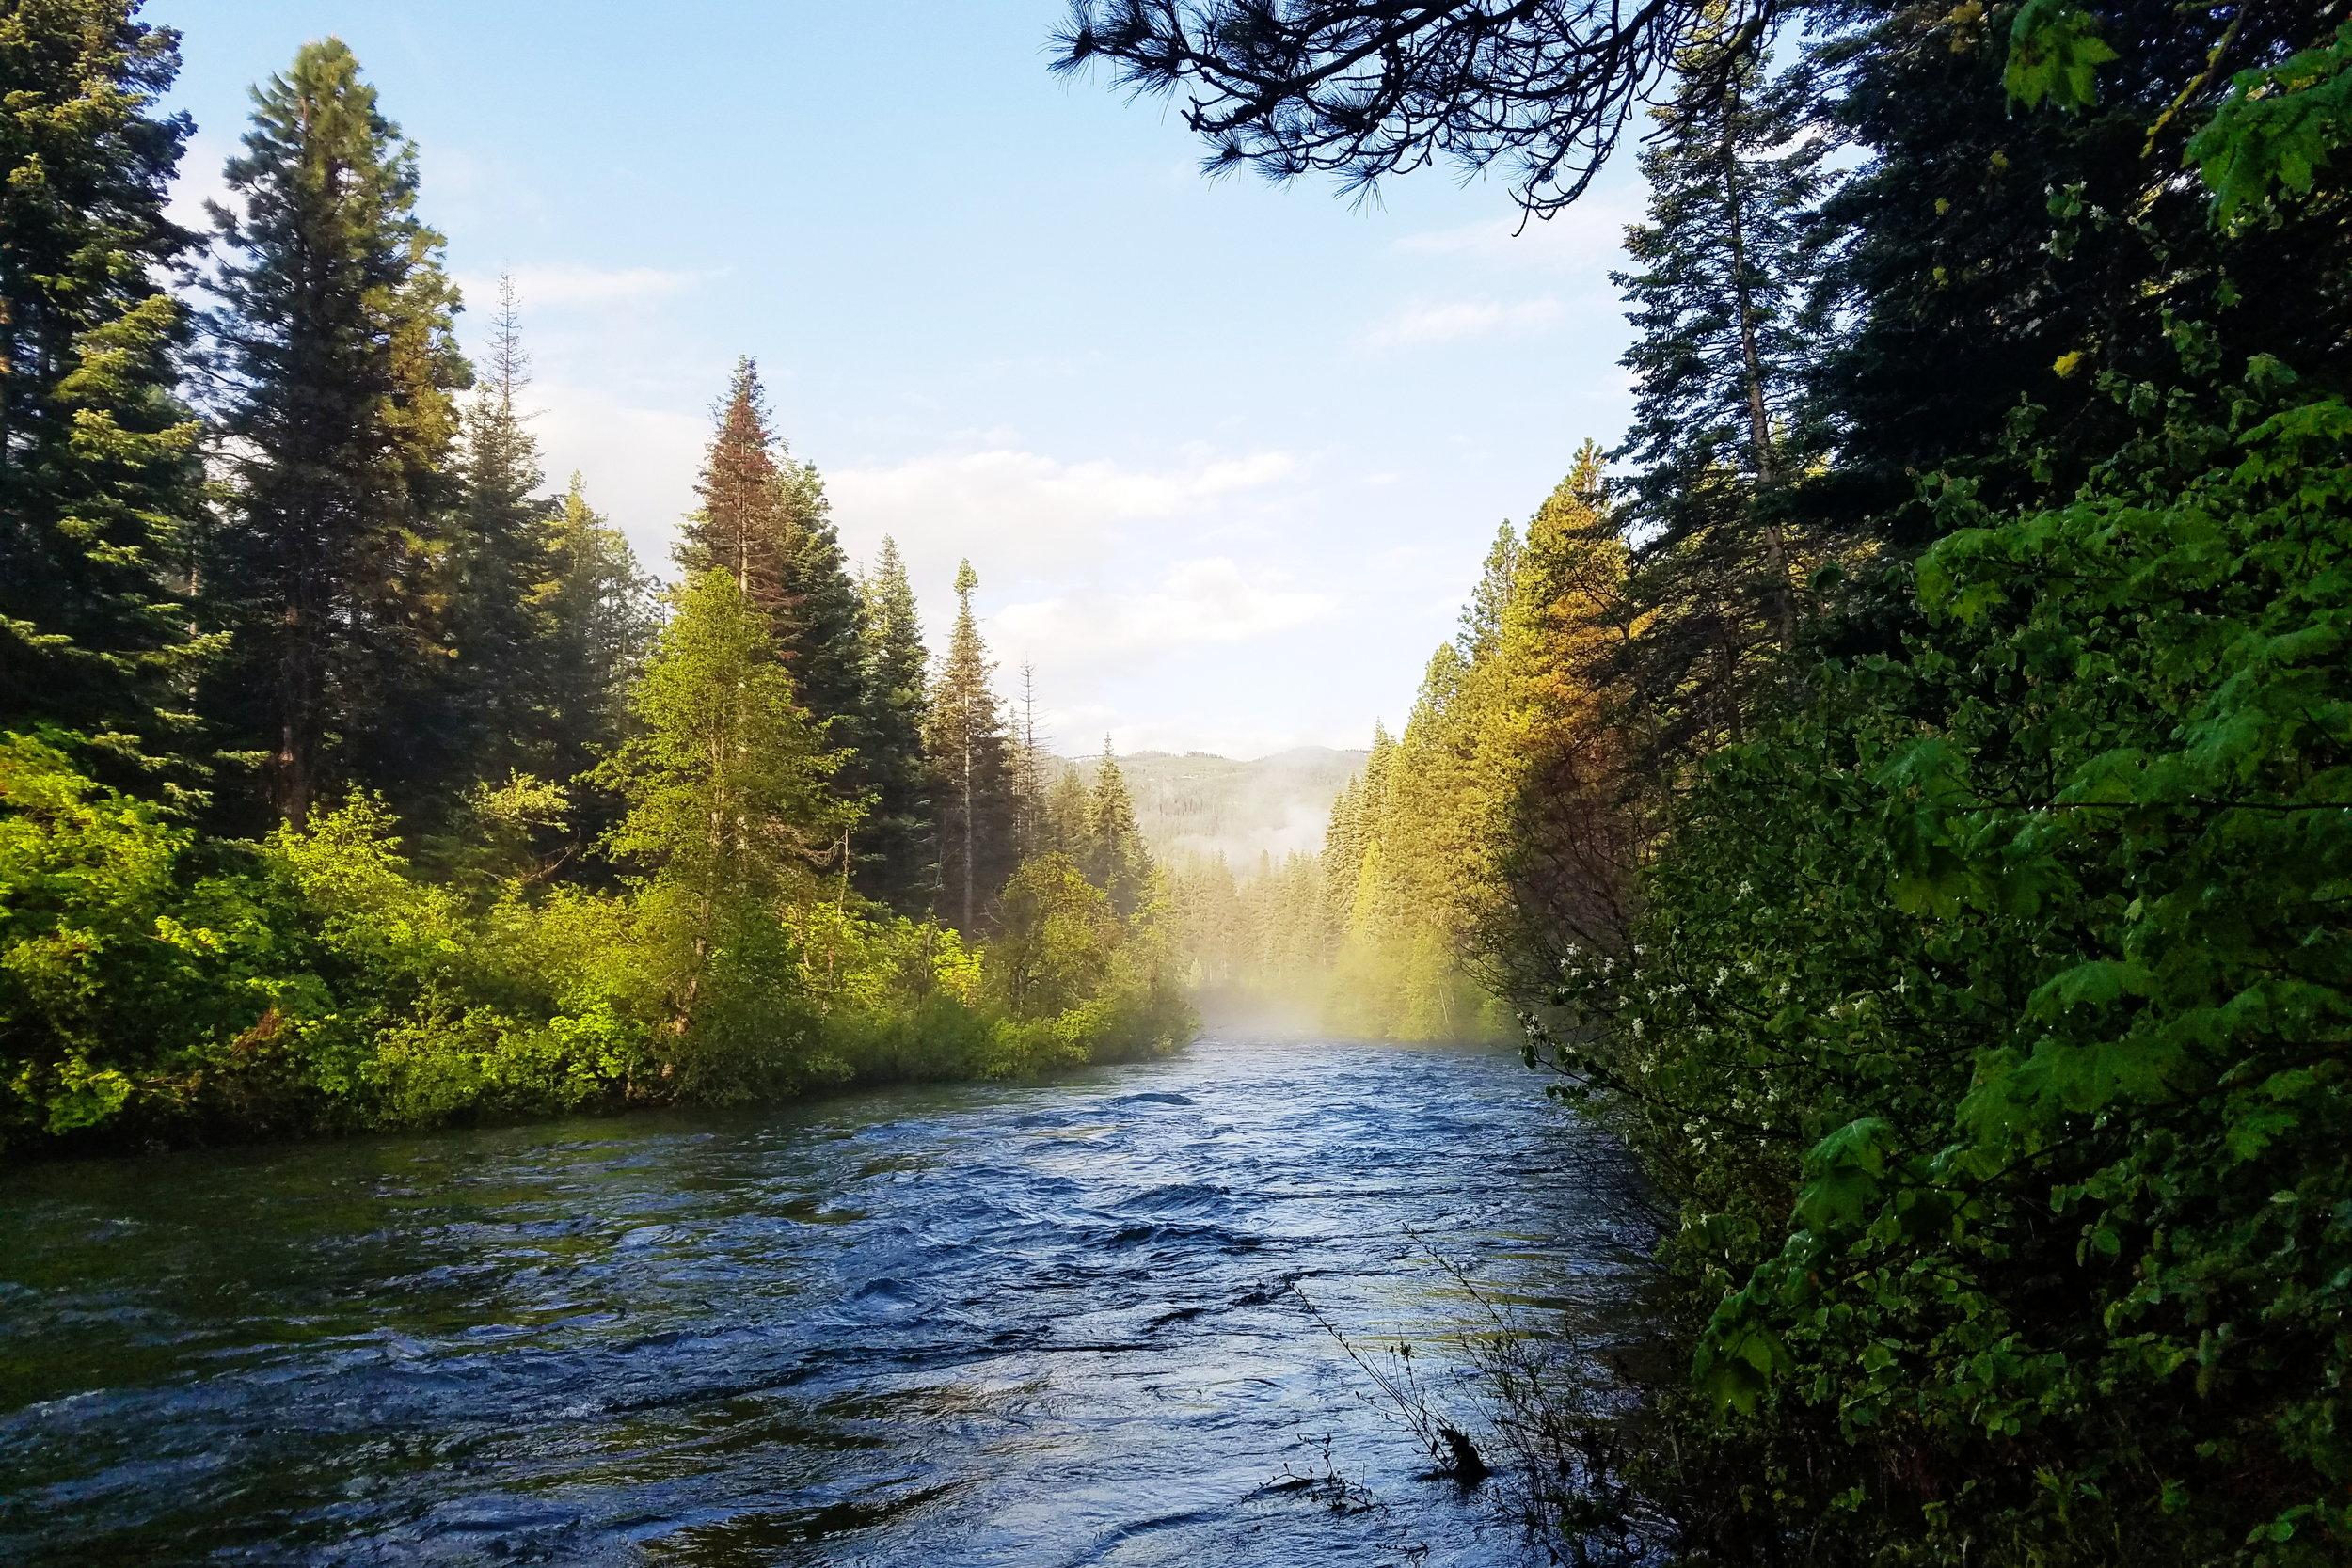 Misty morning view of Nason Creek